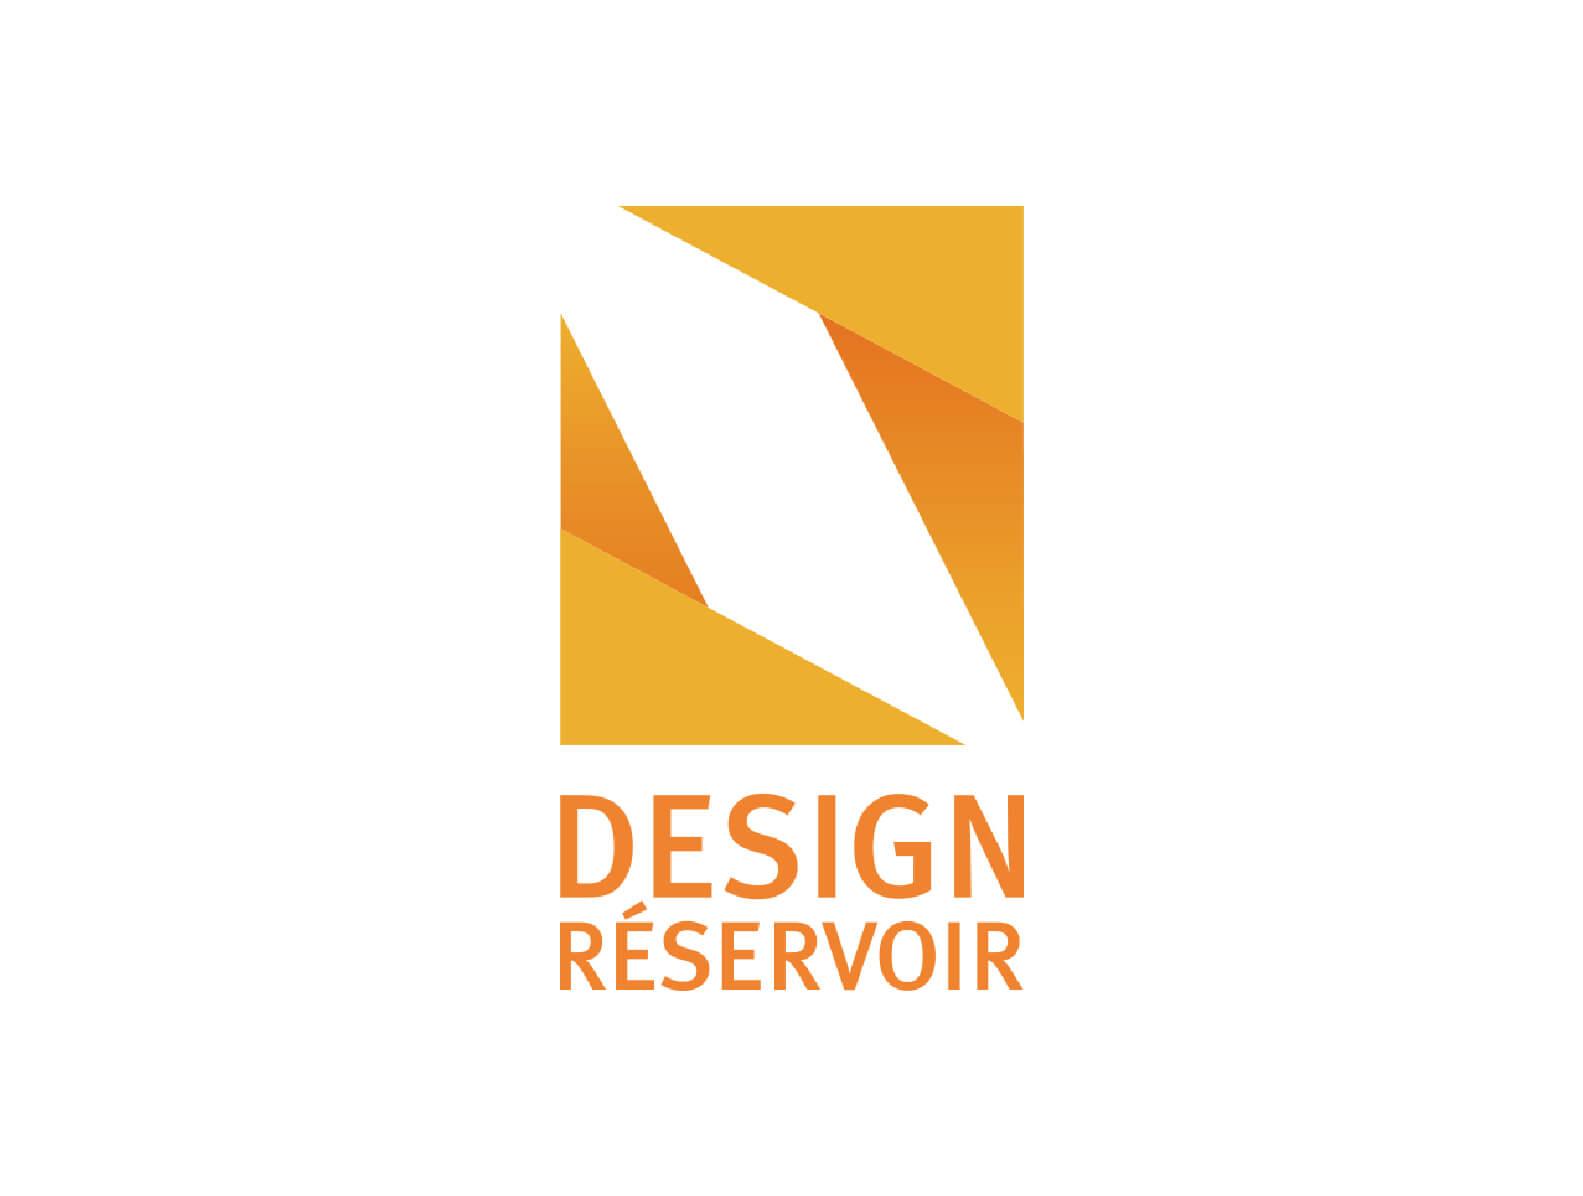 agence kayak communication web lille nord logo design reservoir